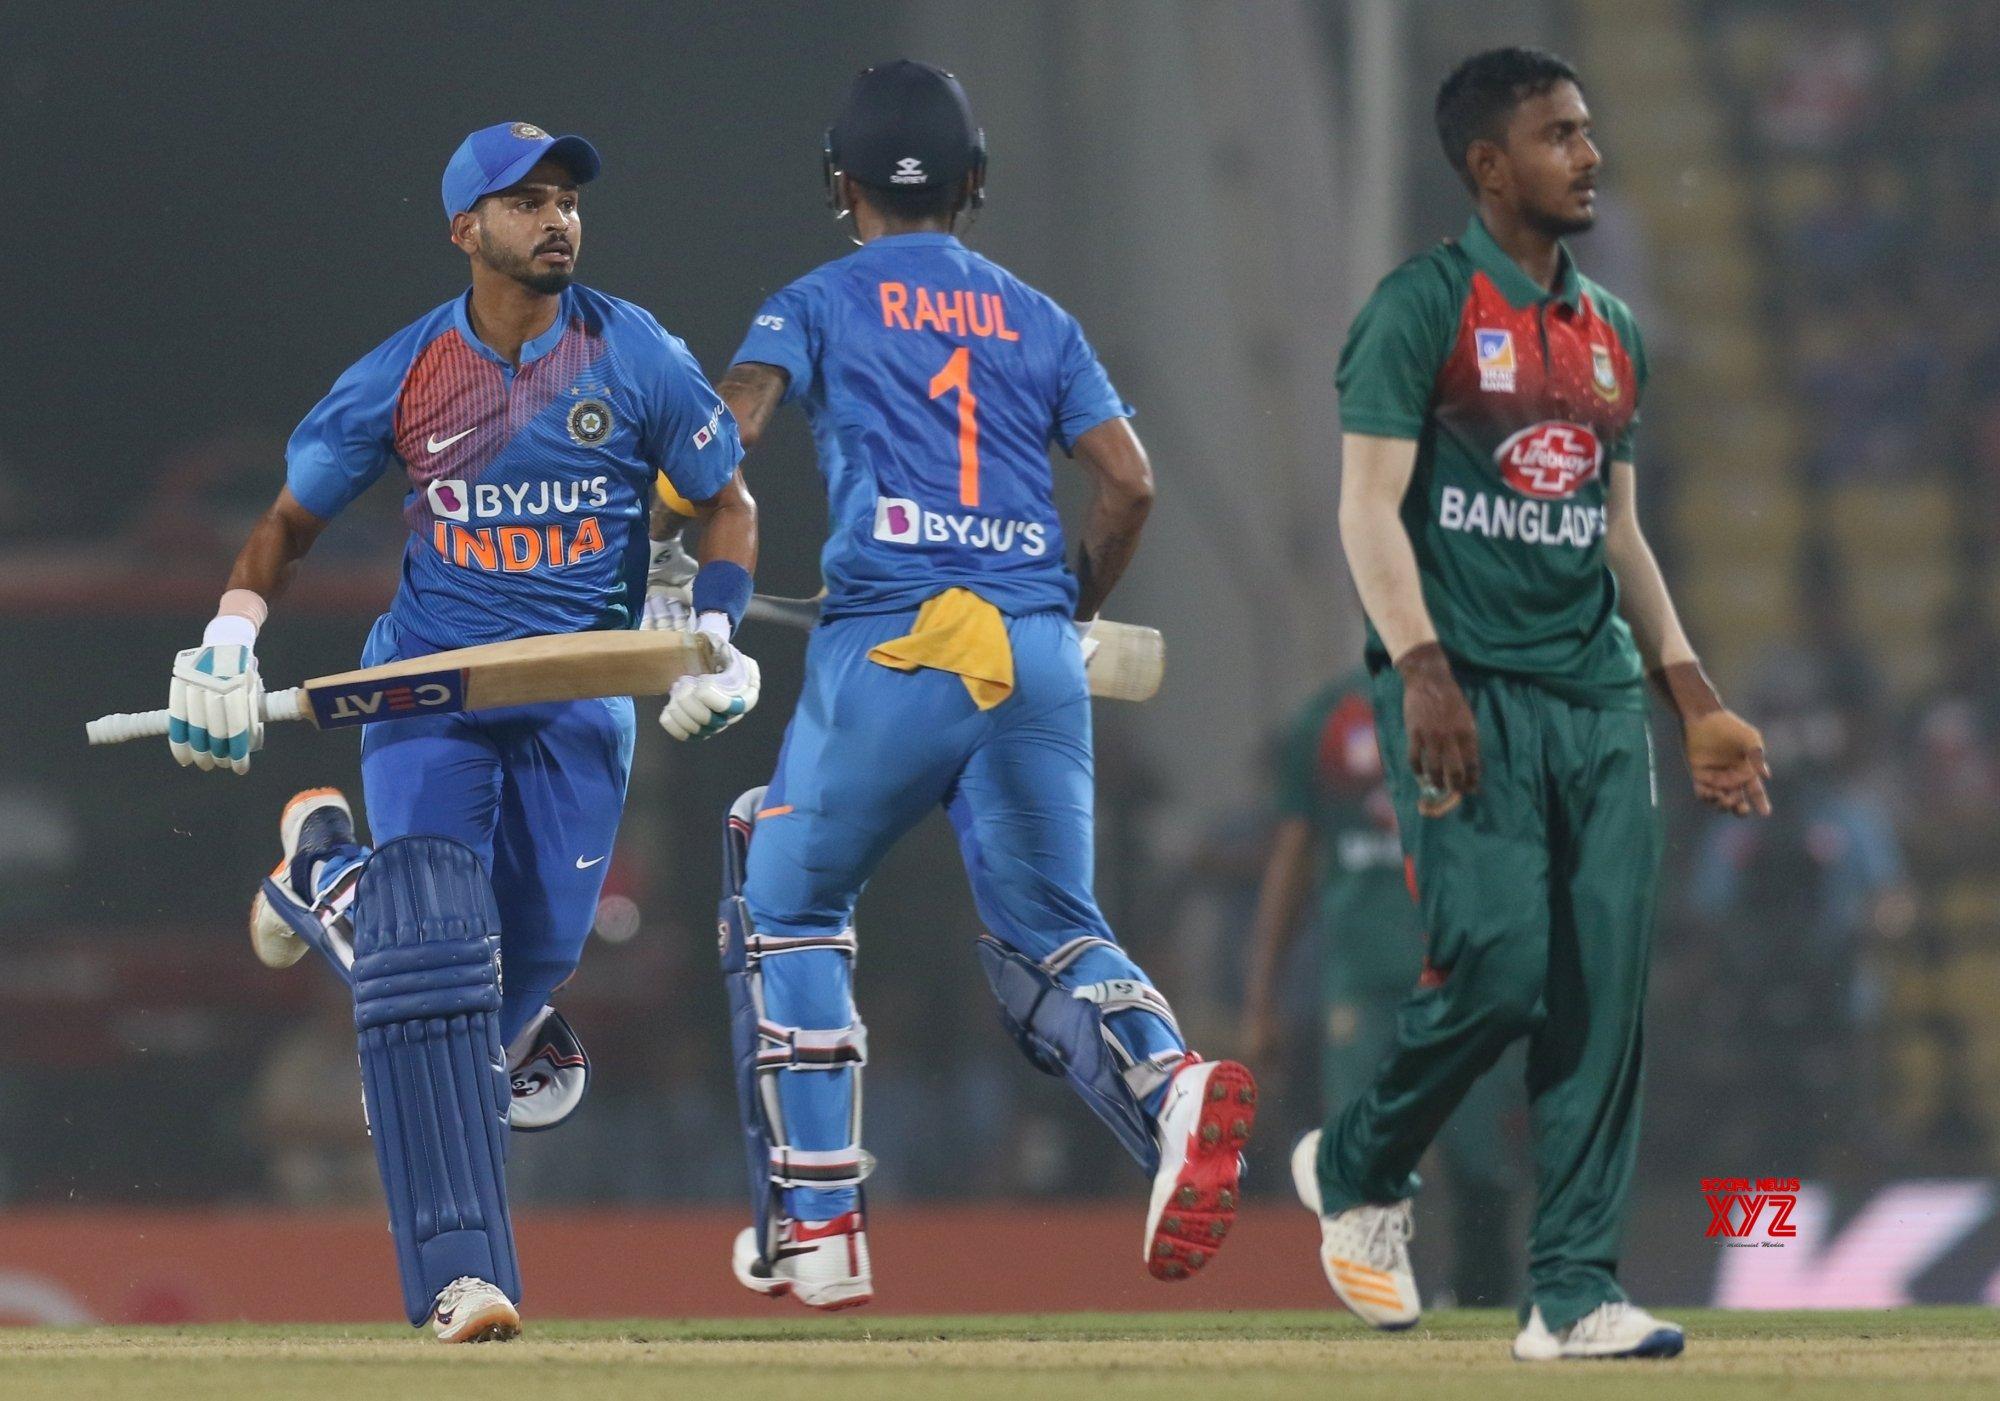 Nagpur: 3rd T20I - India Vs Bangladesh (Batch - 7) #Gallery